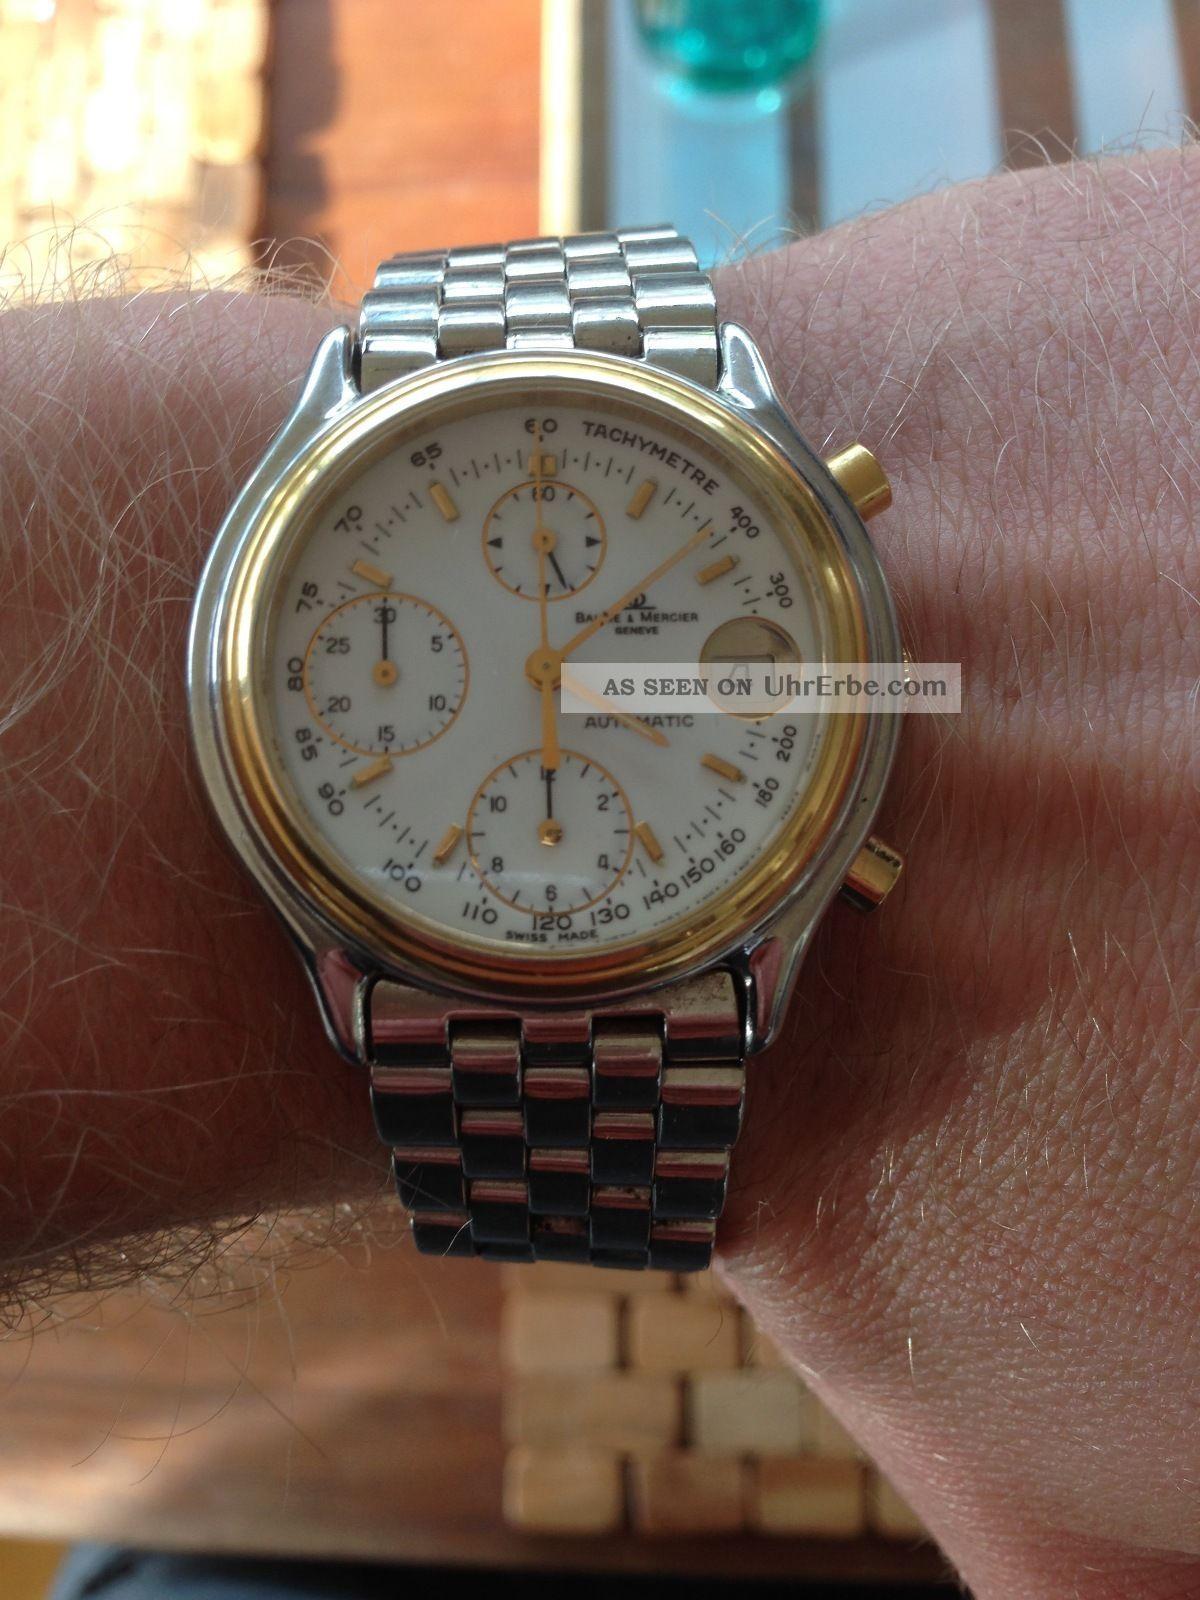 Baume & Mercier Baumatic Chronograph Gold Armbanduhren Bild